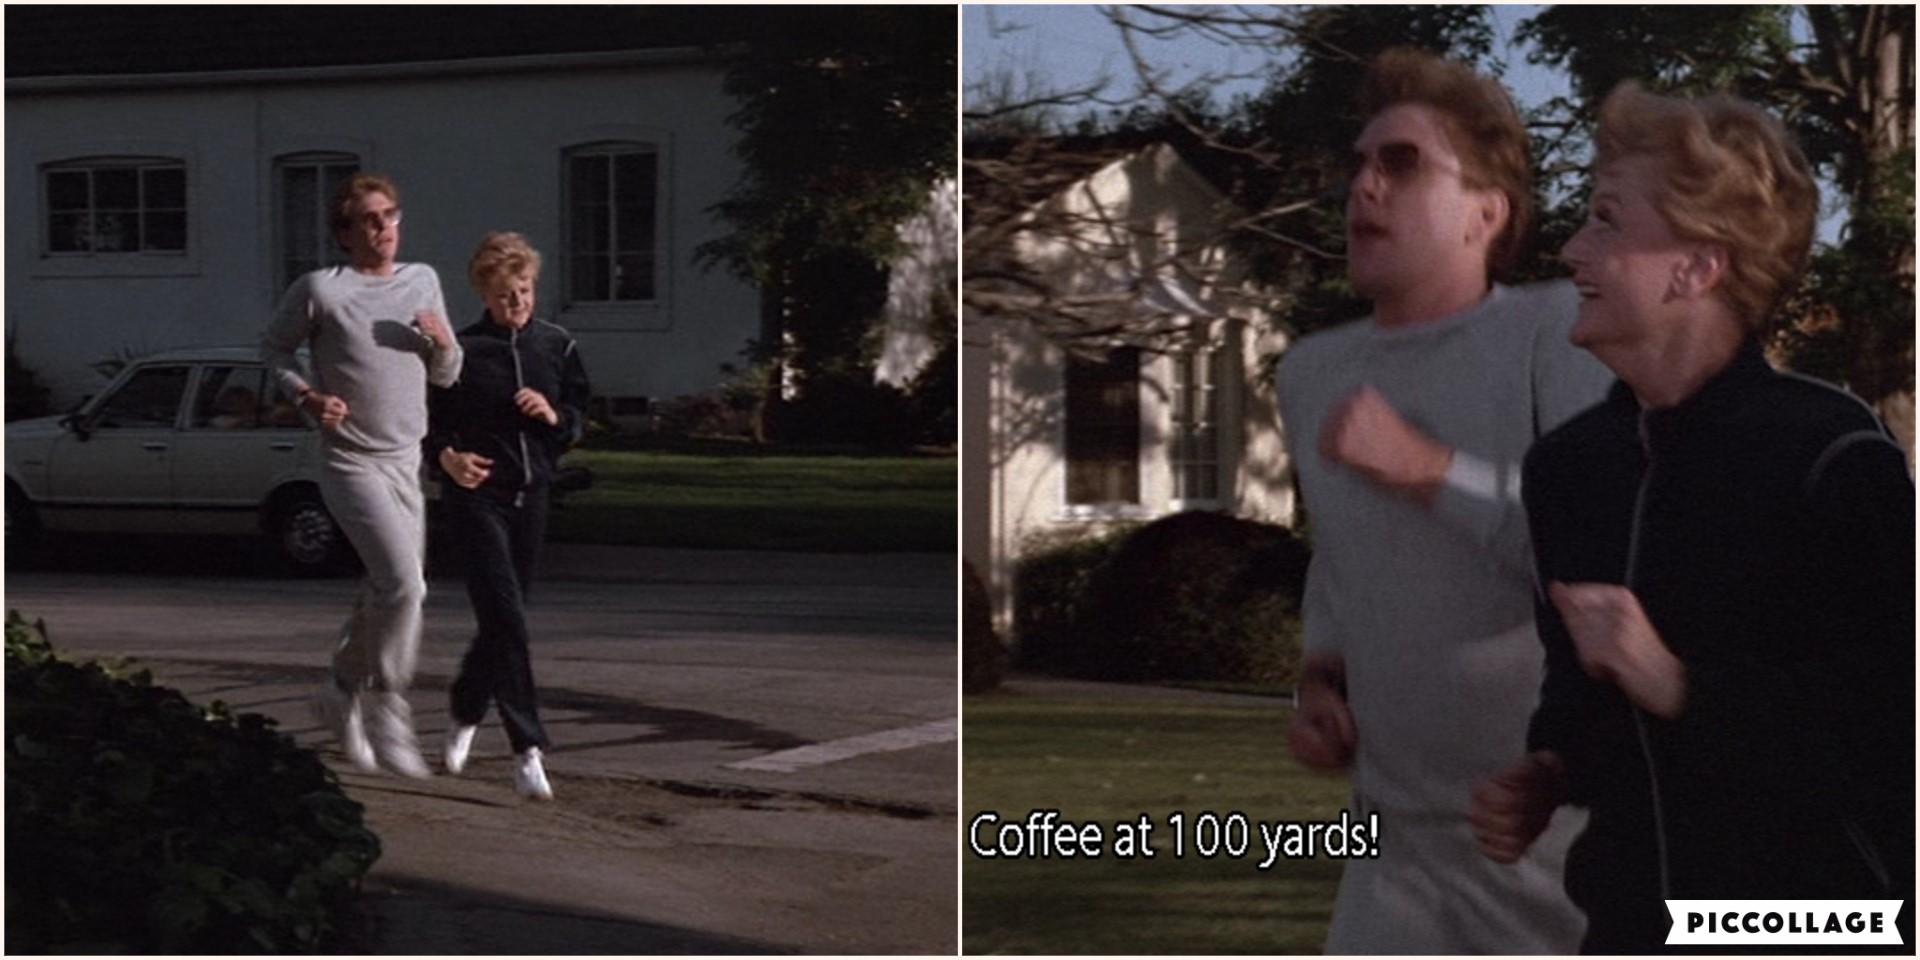 MSW3-22-jogging